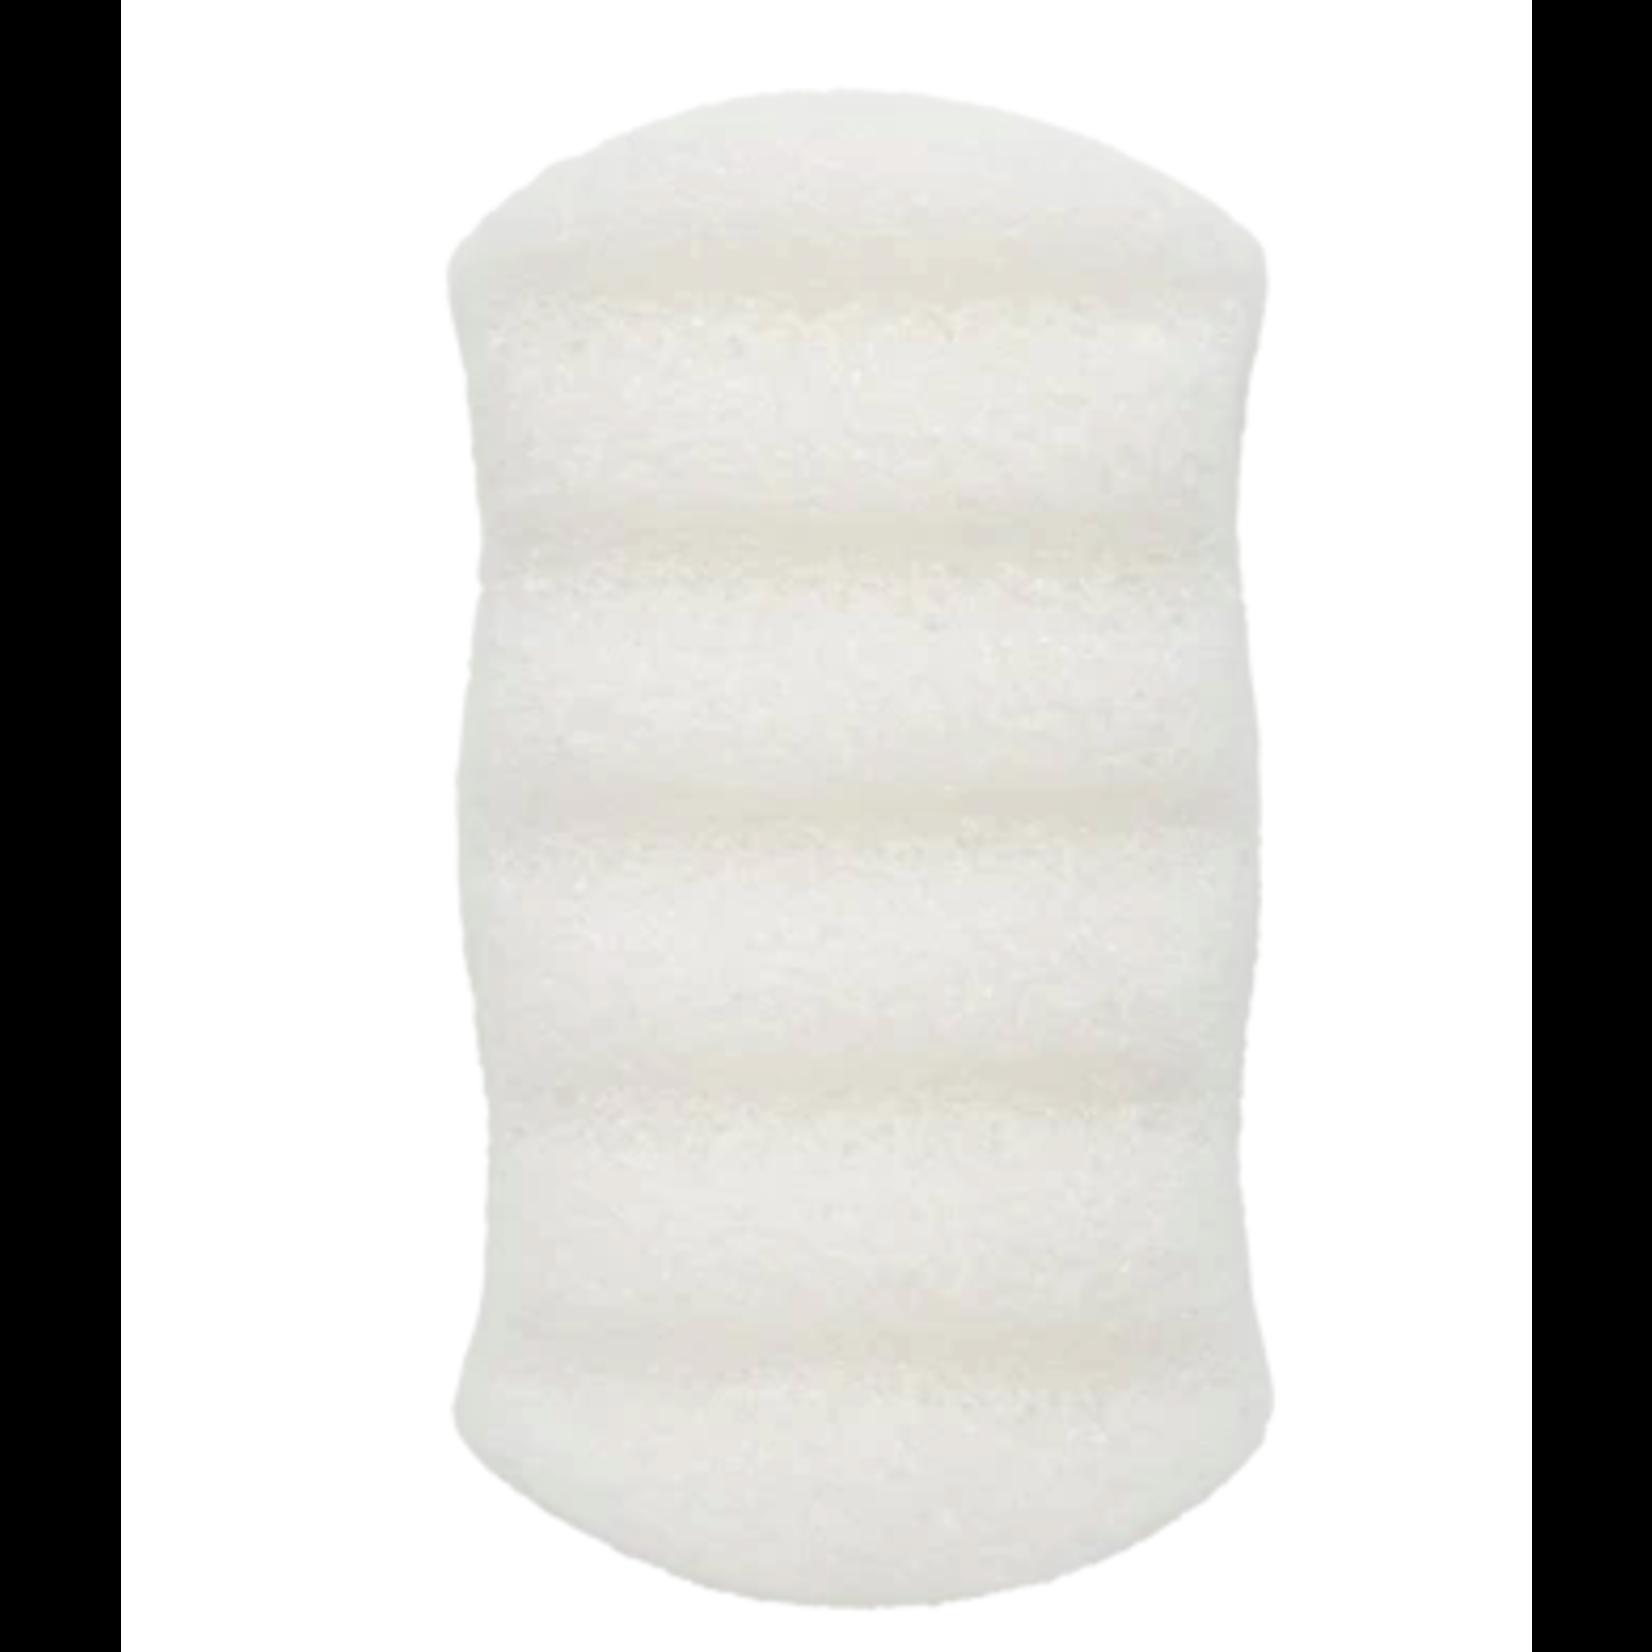 Eco Revolution Konjac Sponge Body Pure